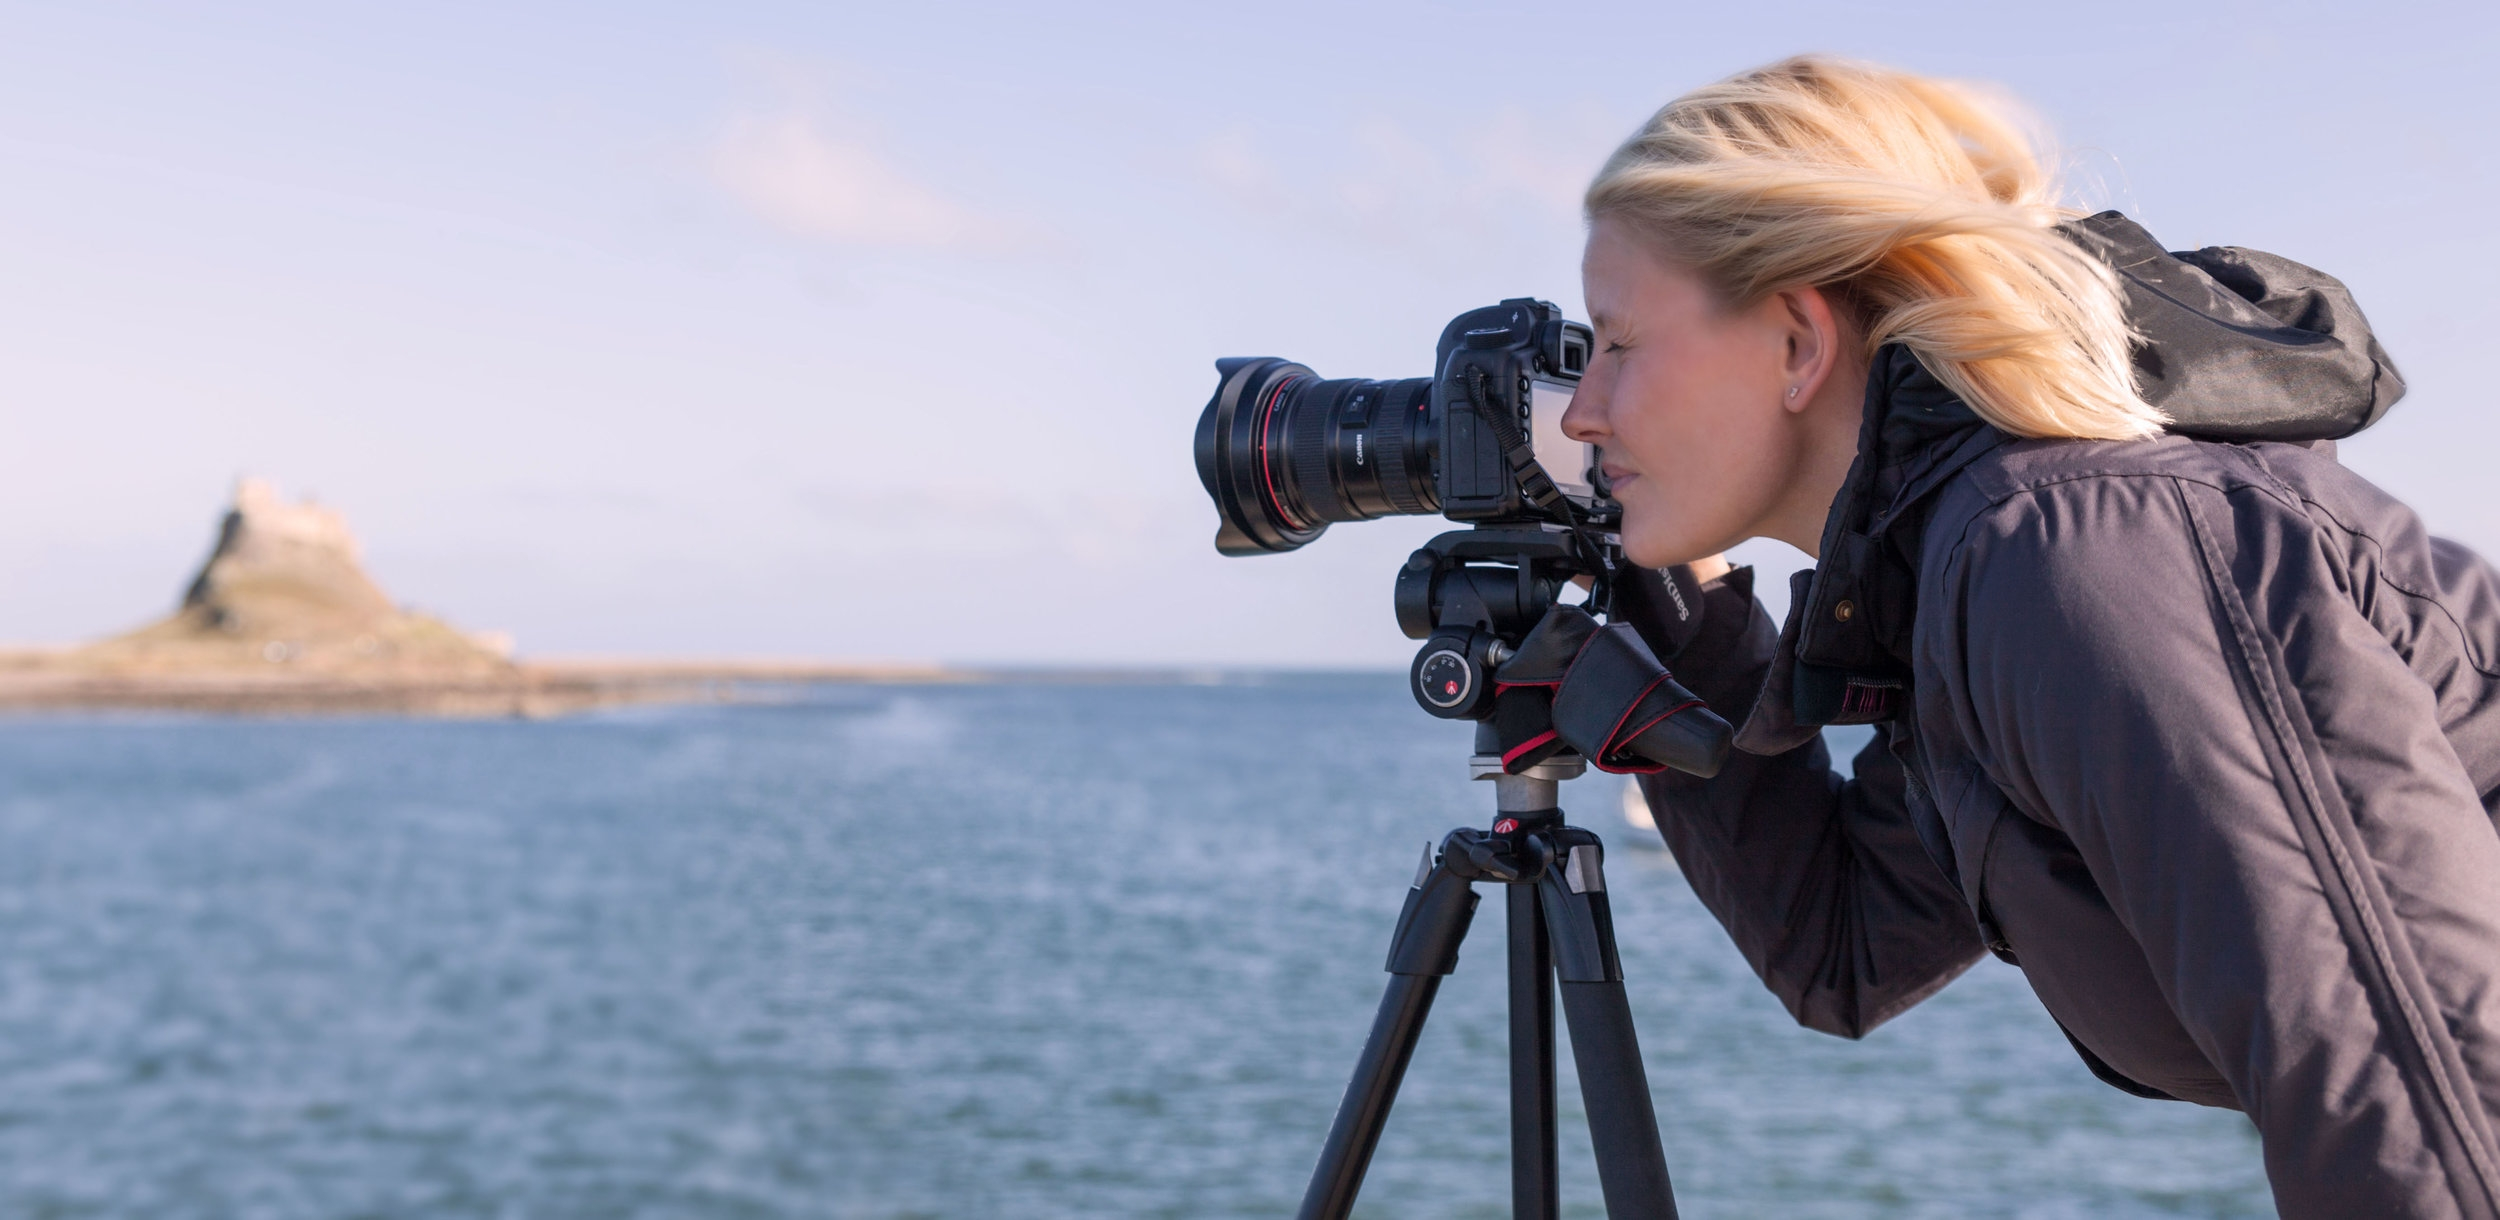 Landscape, Nature & Travel Photographer / Writer / Educator / Speaker / Emma Rothera at work.